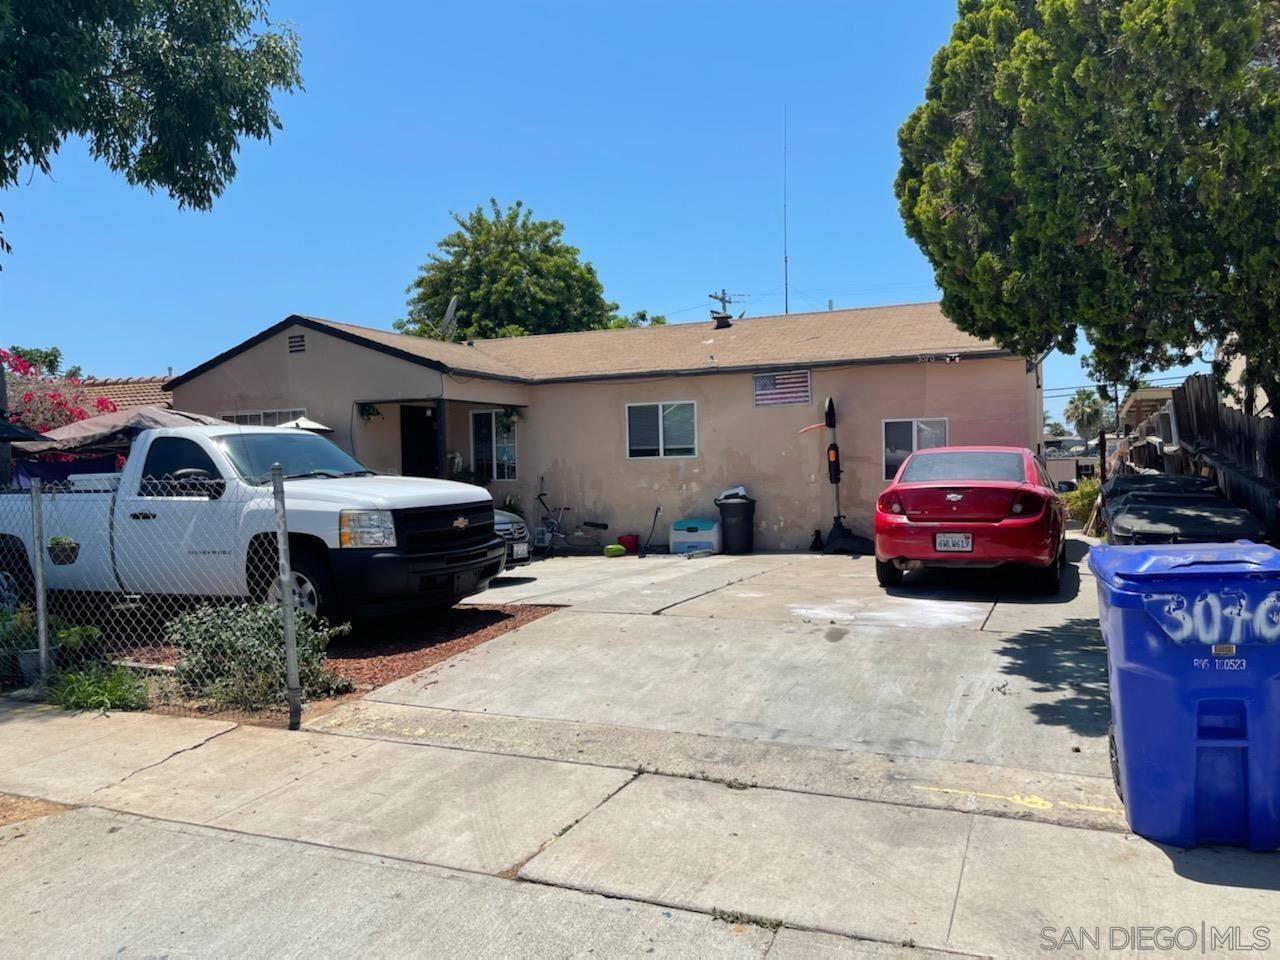 Photo of 3070-72 44th St, San Diego, CA 92105 (MLS # 210021348)